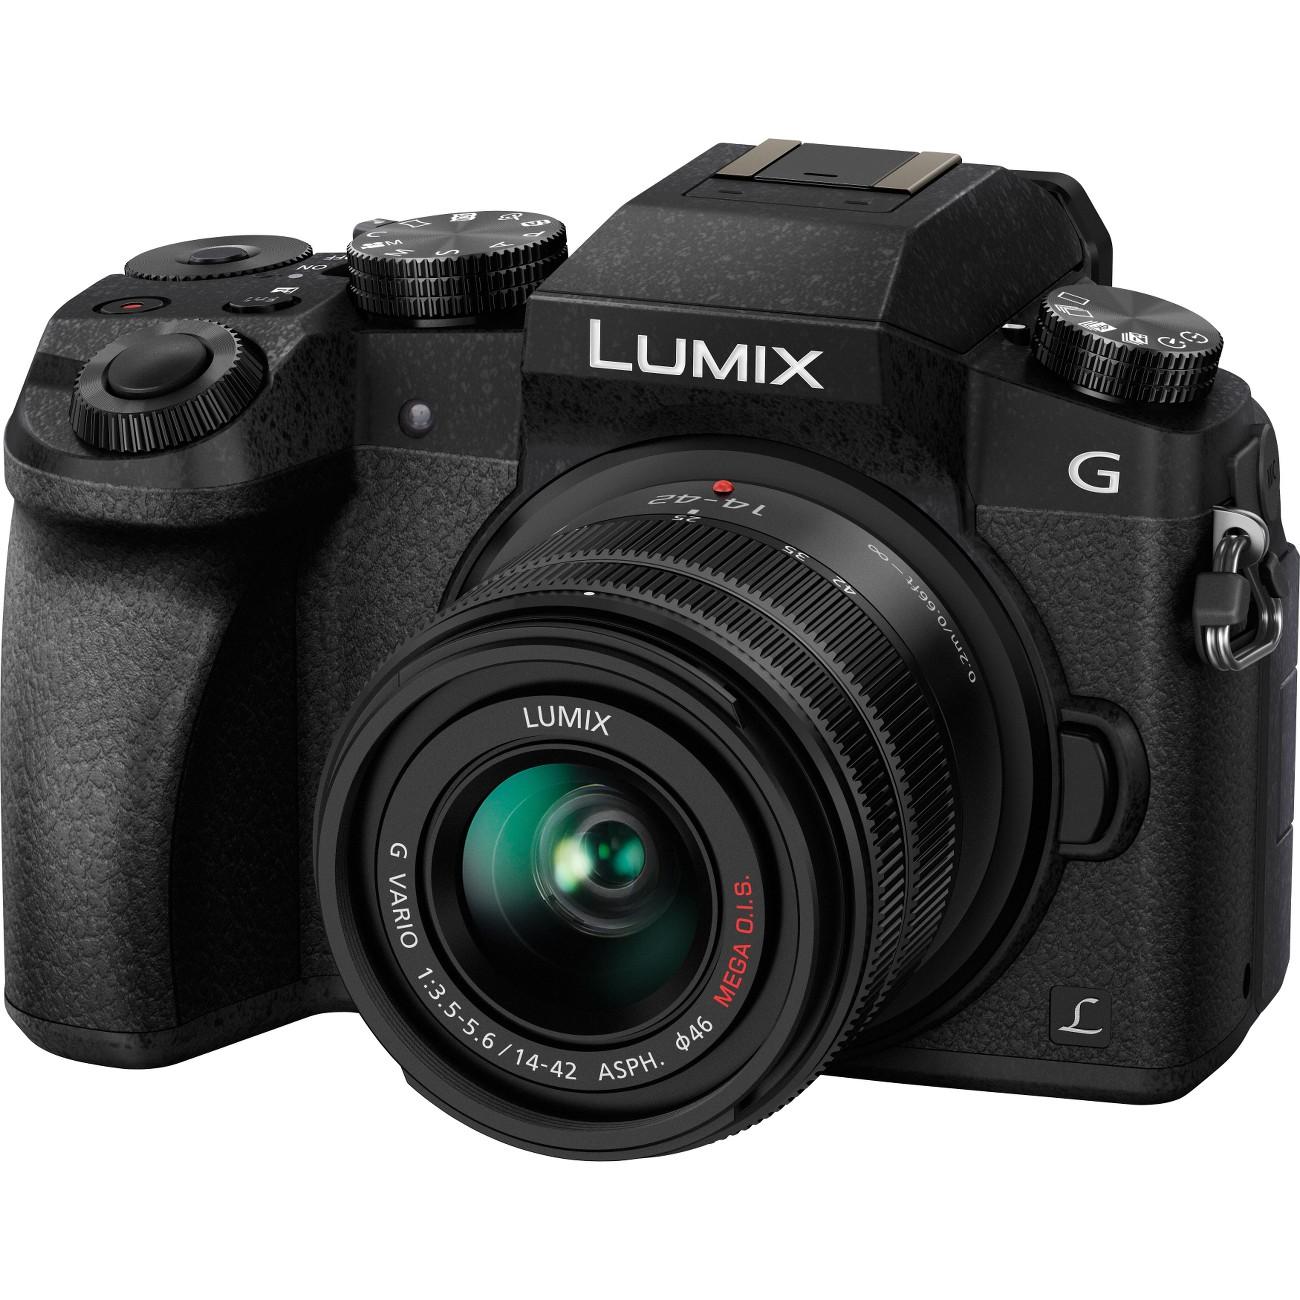 Panasonic Lumix DMC-G7 16 Megapixel Mirrorless Camera with Lens - 14 mm - 42 mm - Black (dmcg7kk)